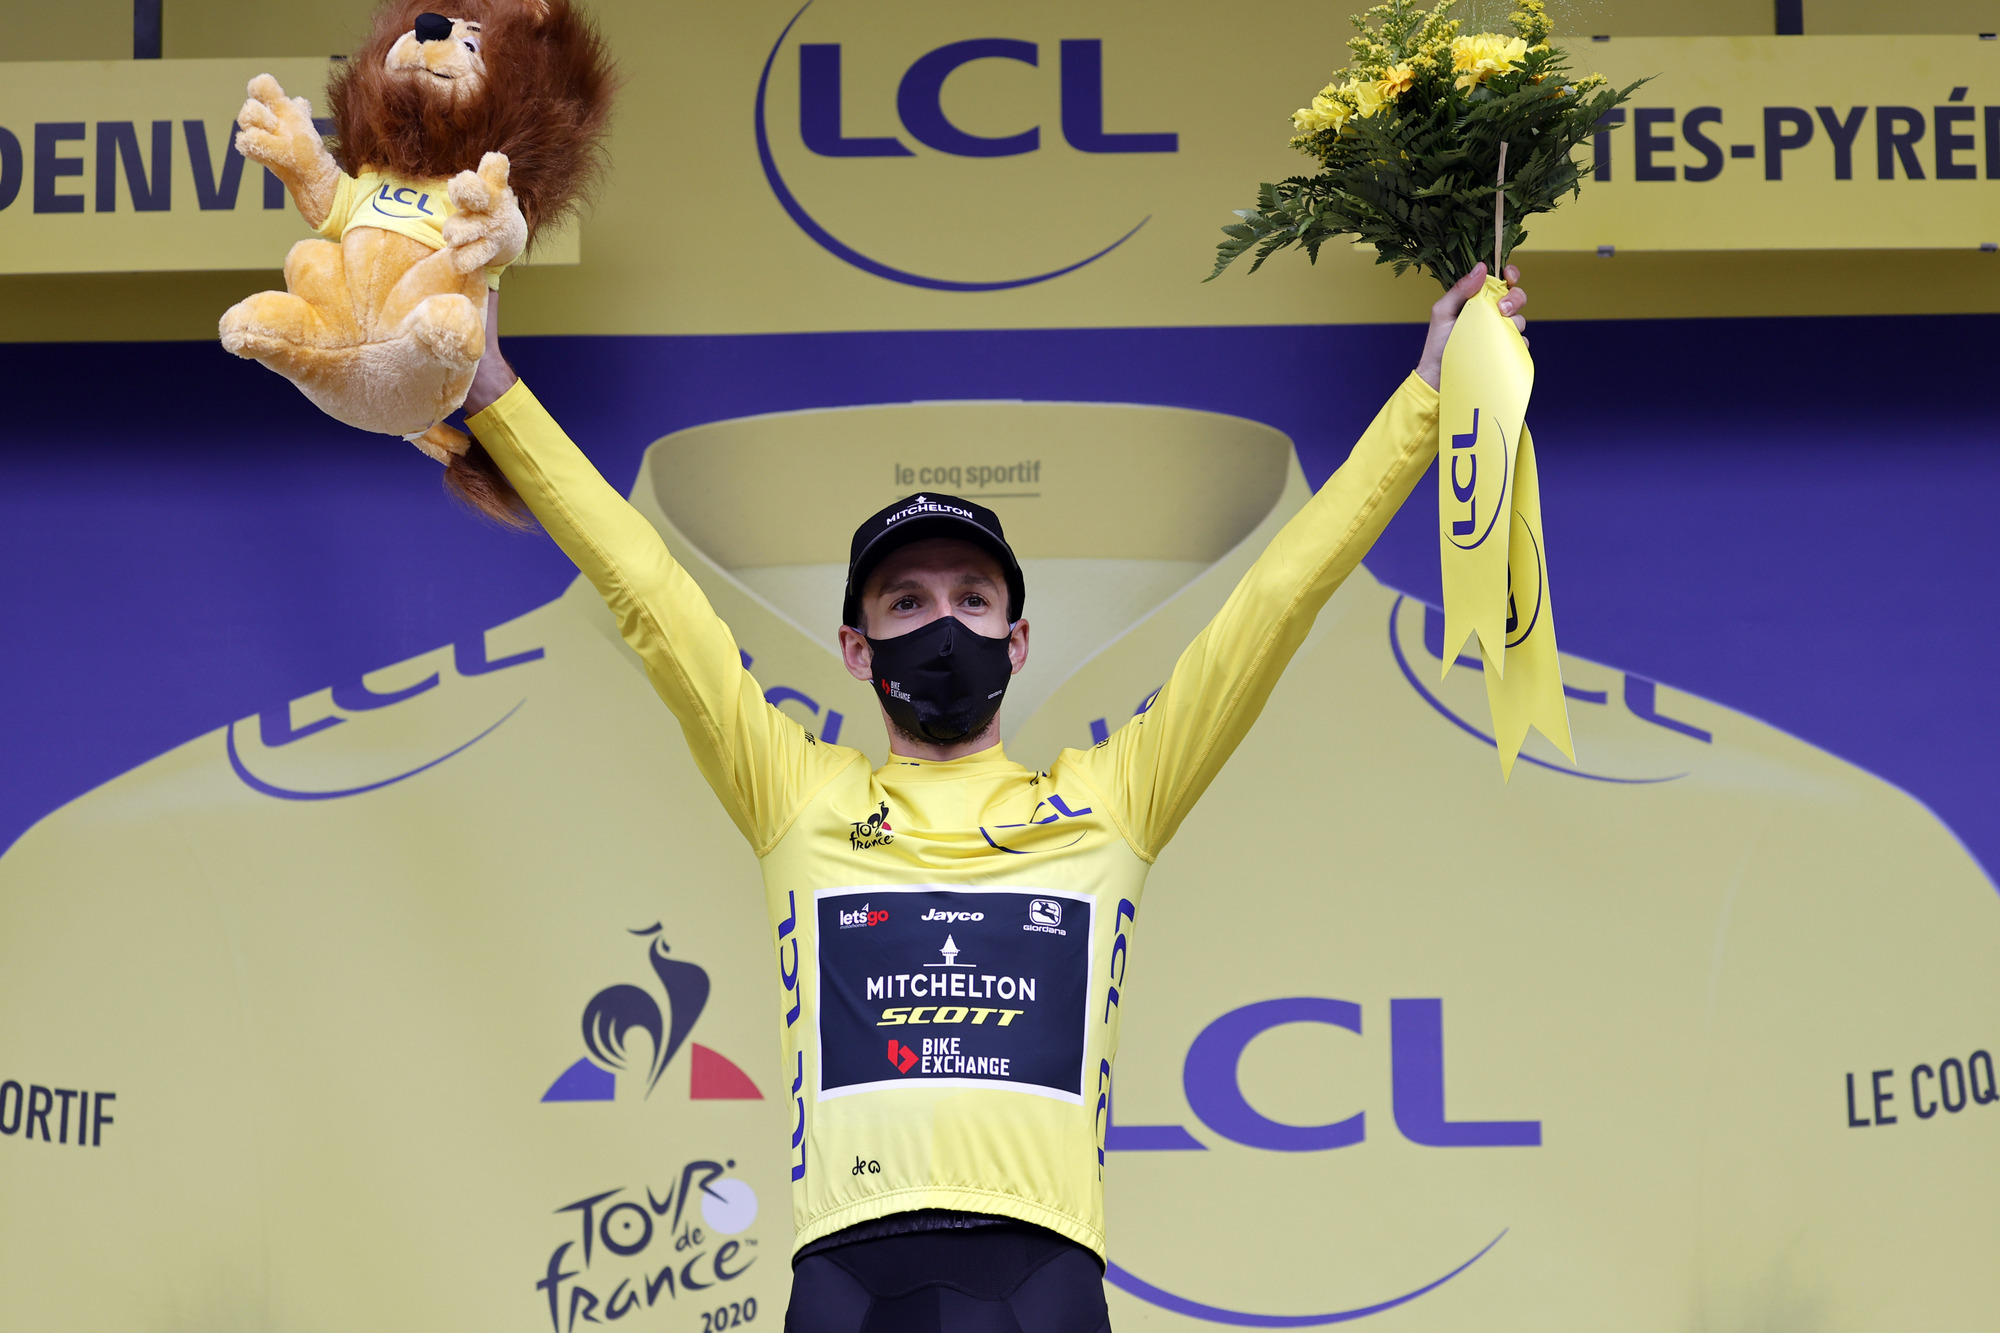 Tour de France 2020 - 107th Edition - 7th stage Cazeres - Loudenvielle 141 km - 05/09/2020 - Adam Yates (GBR - Mitchelton - Scott) - photo POOL Sunada/BettiniPhoto©2020